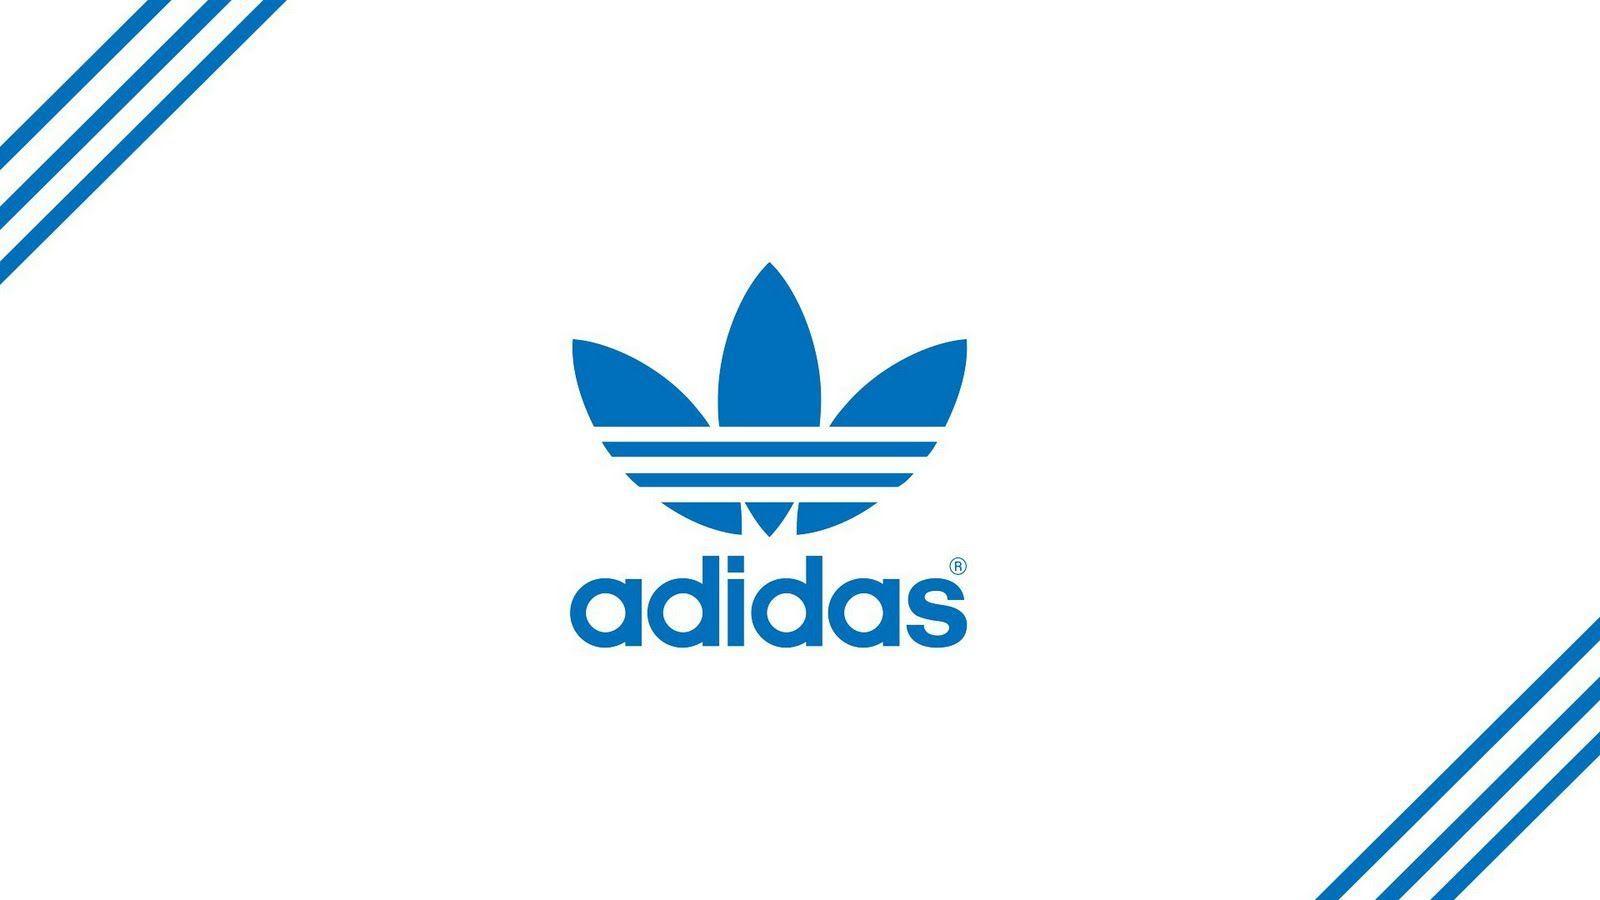 Adidas Wallpaper 38 108860 Images HD Wallpapers  Wallfoy.com